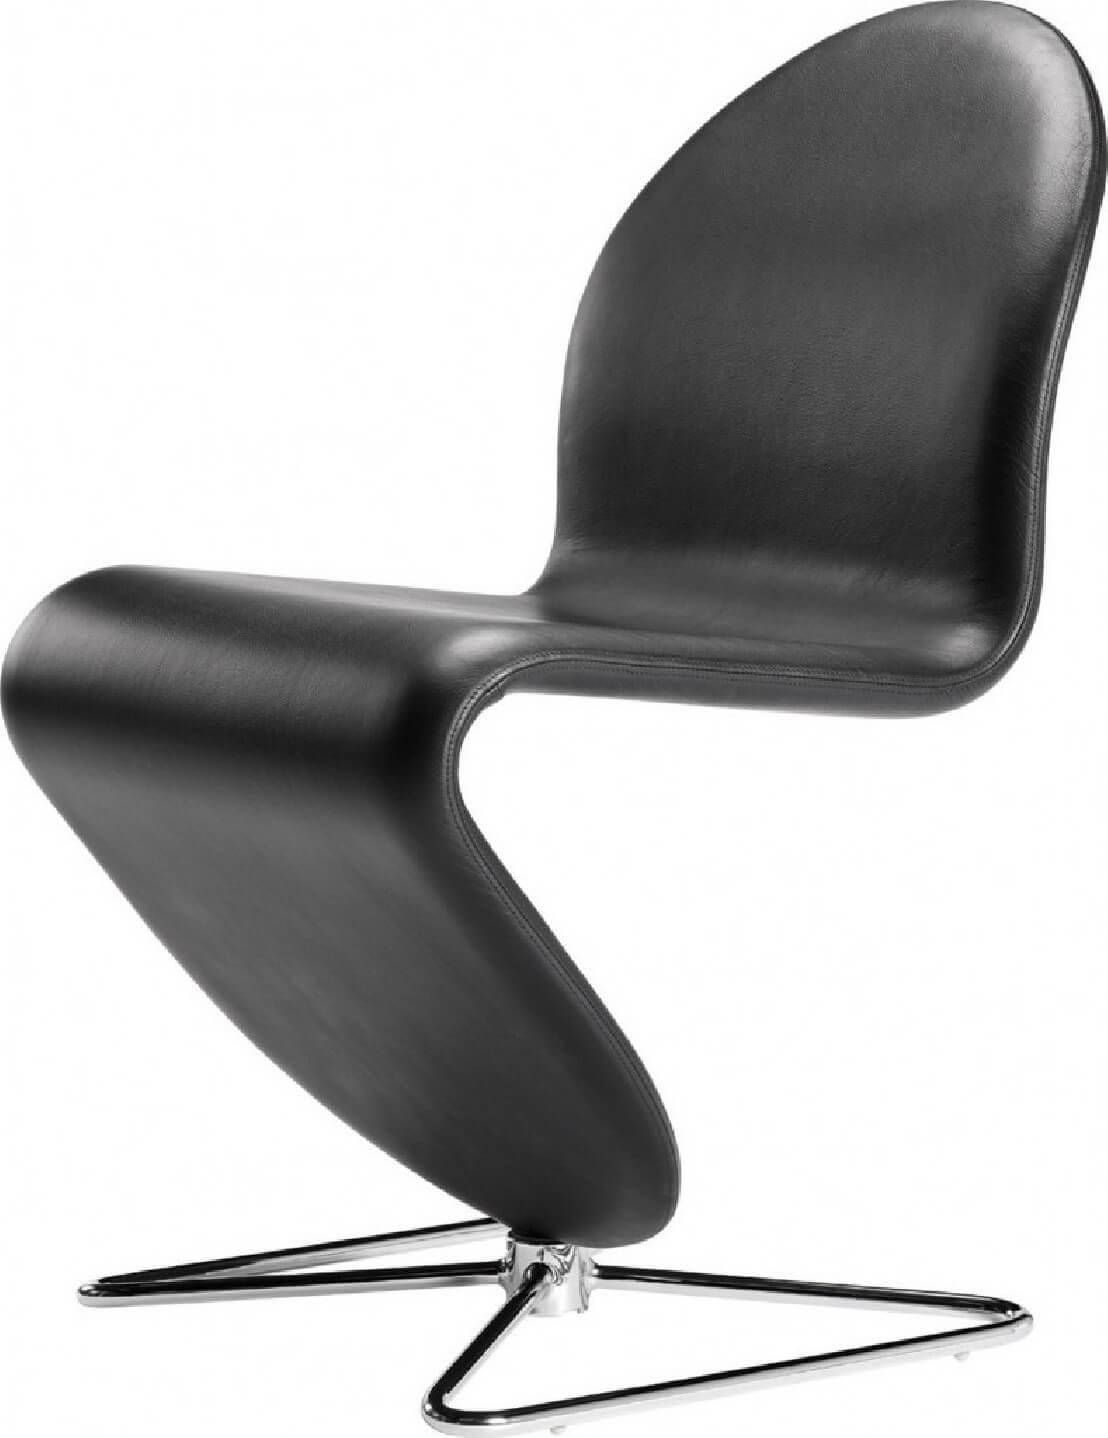 chaise verner panton dining cuir verpan pied papillon. Black Bedroom Furniture Sets. Home Design Ideas